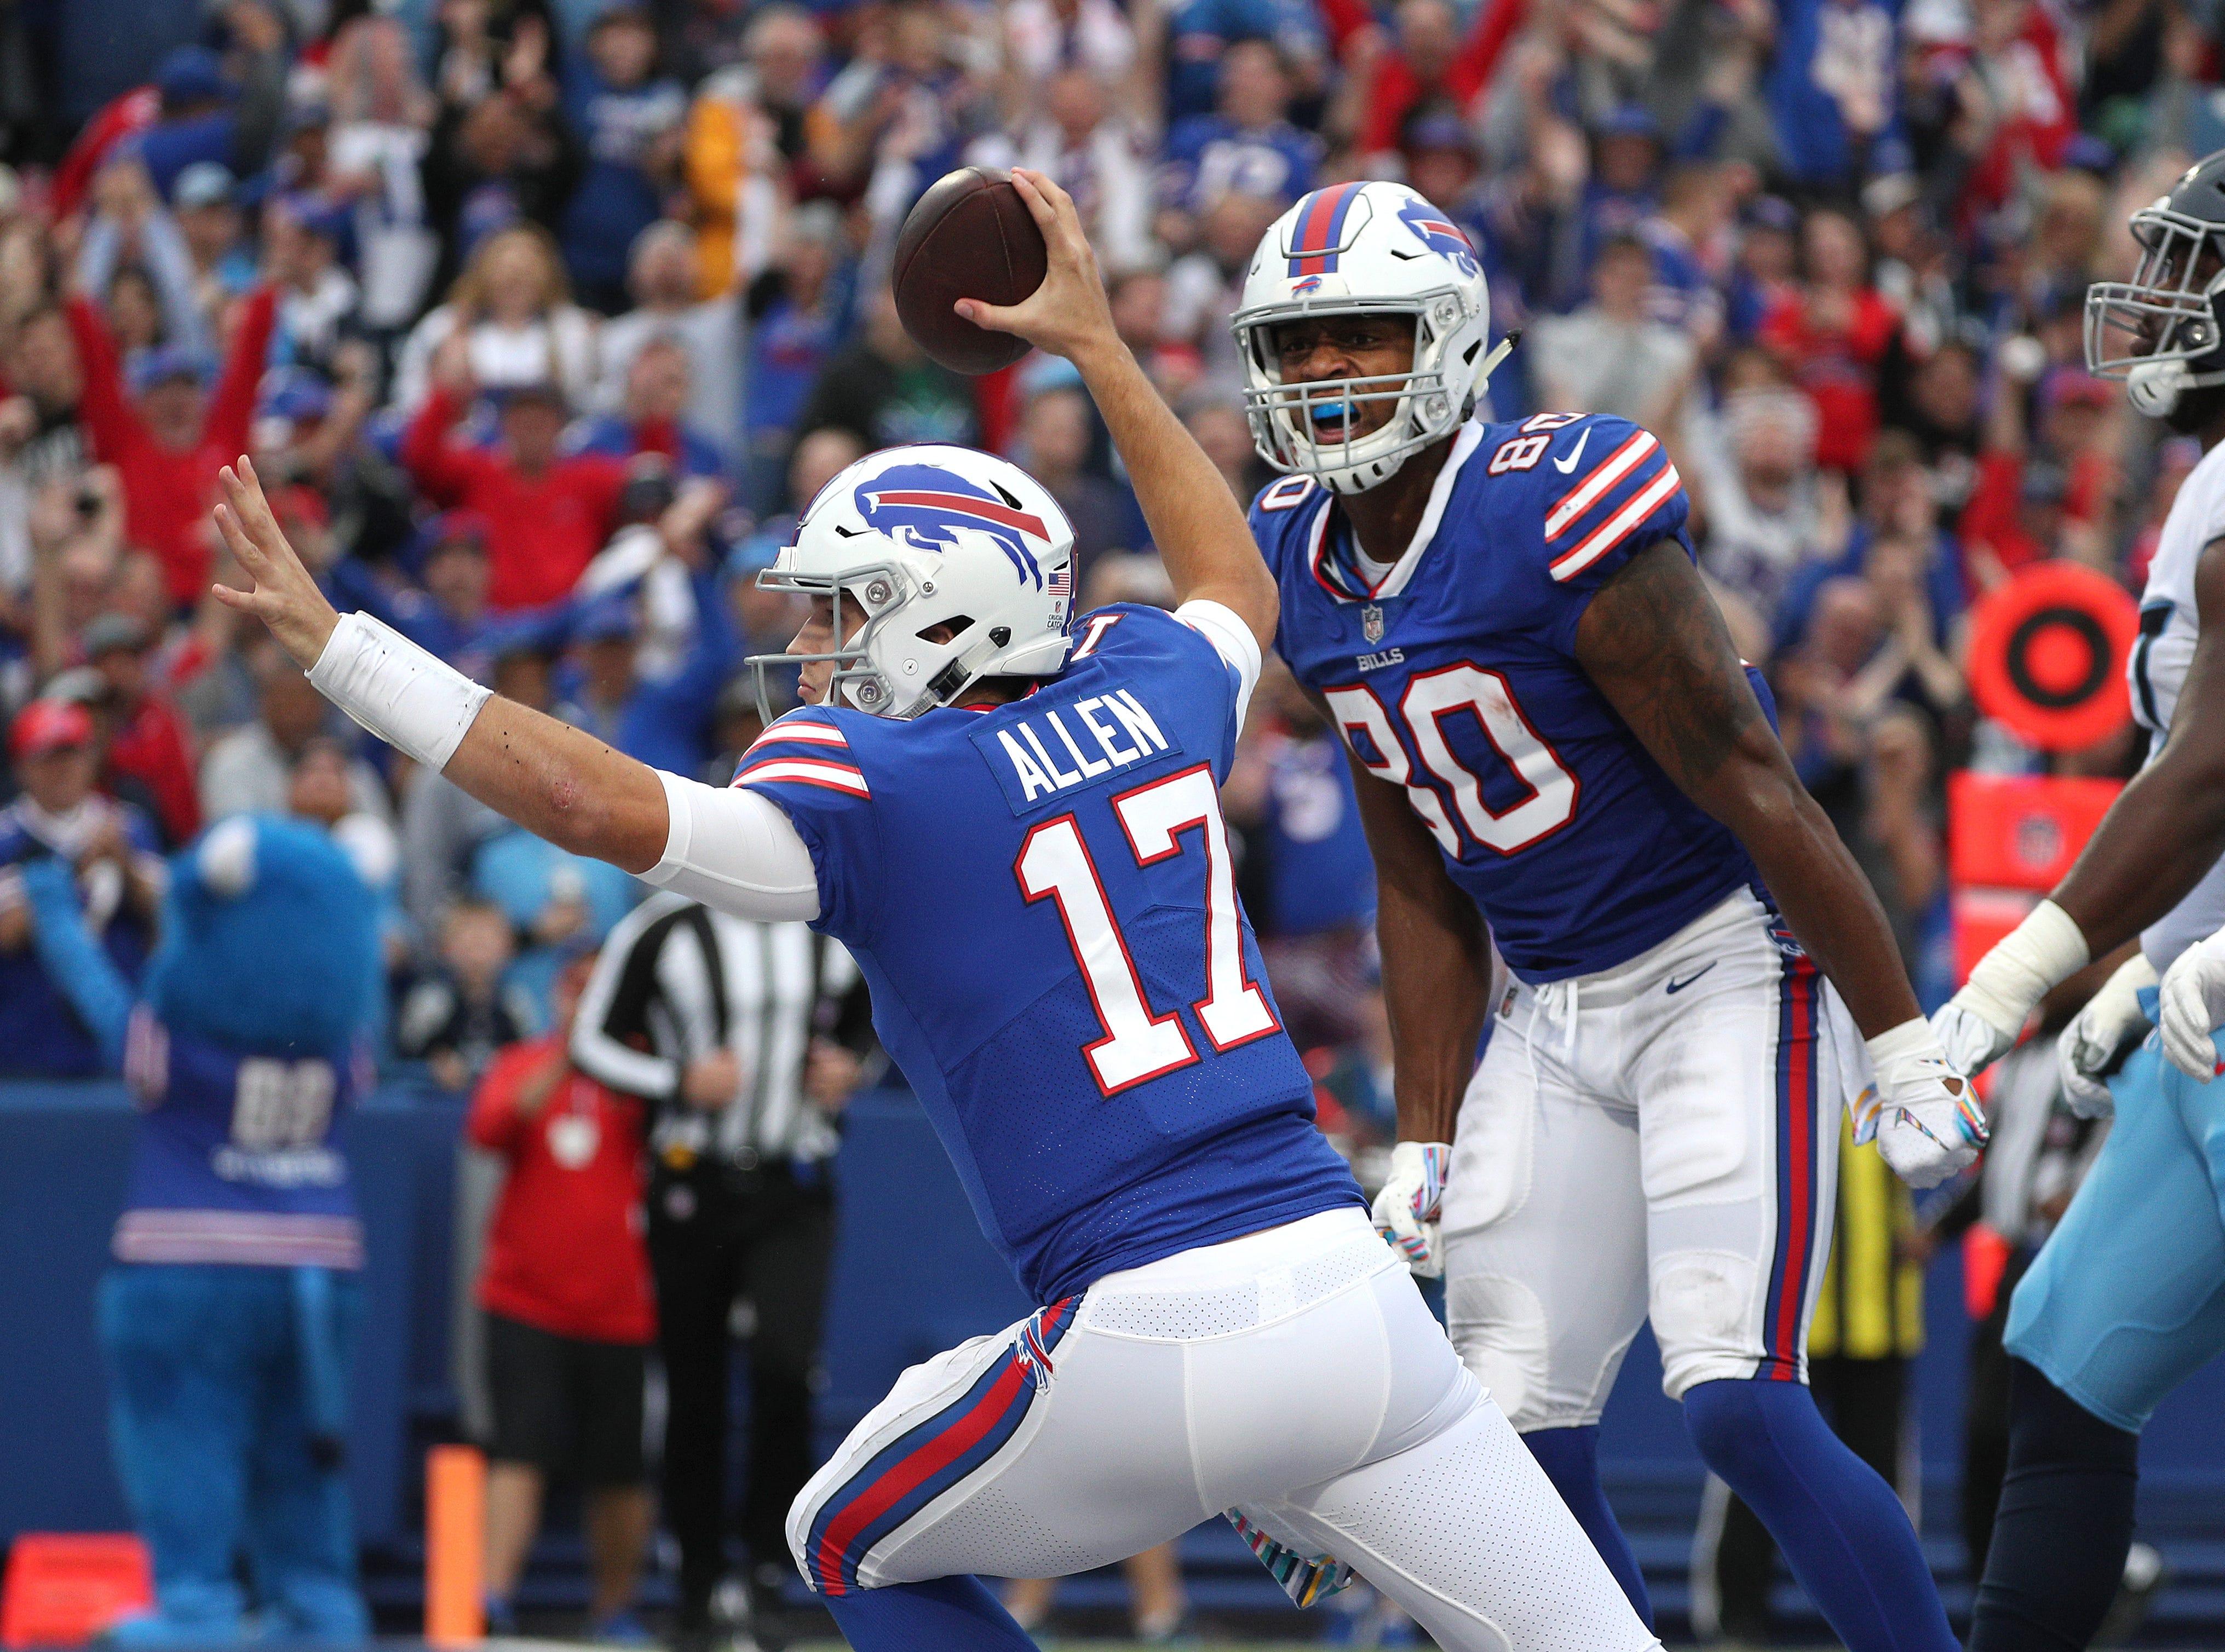 Bills quarterback Josh Allen celebrates his first quarter touchdown scramble against the Titans.